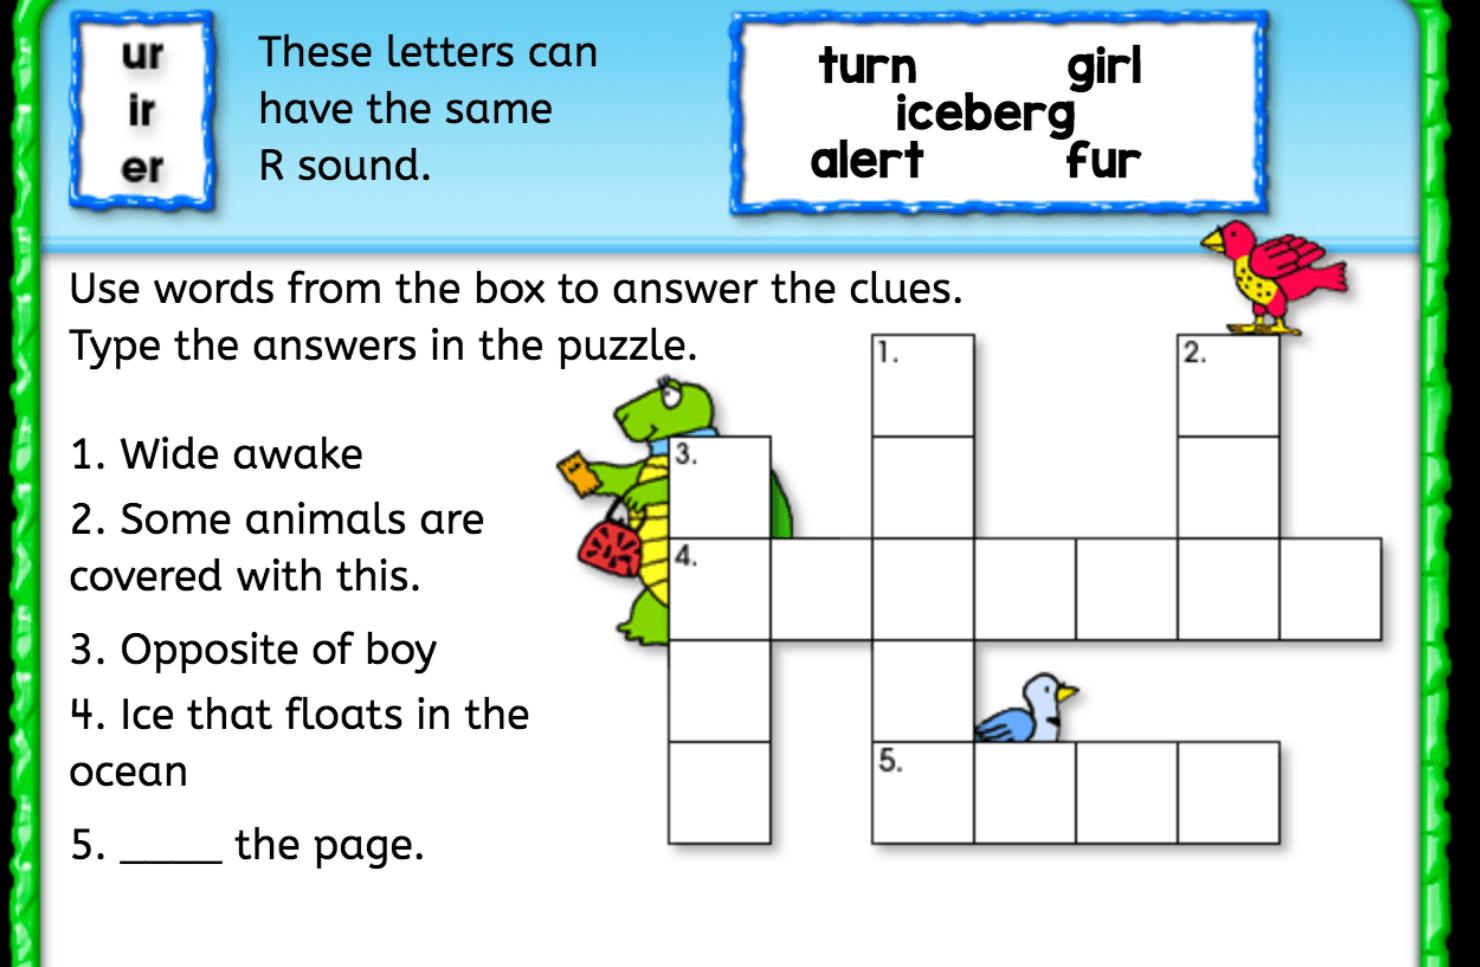 Same R Sound Crossword Puzzle